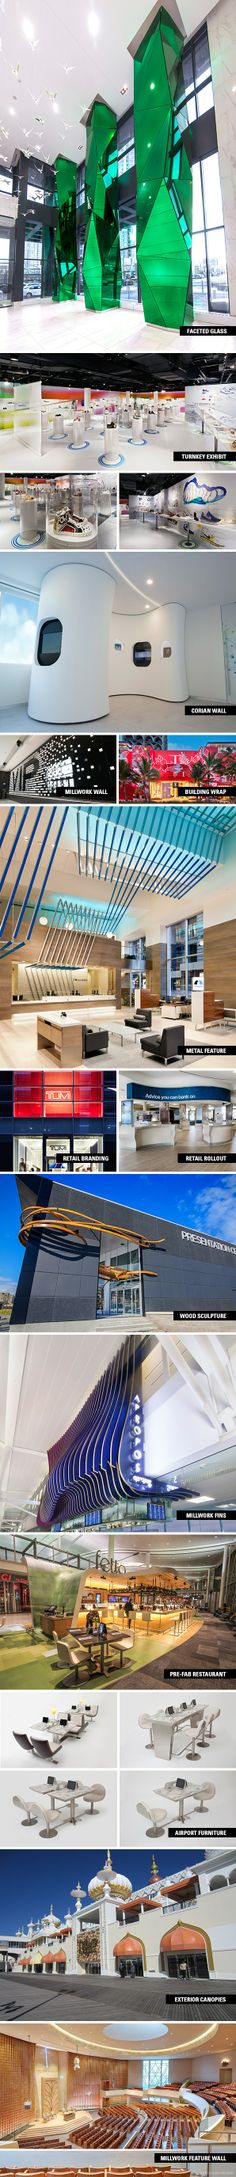 Eventscape | Custom Architectural Fabrication